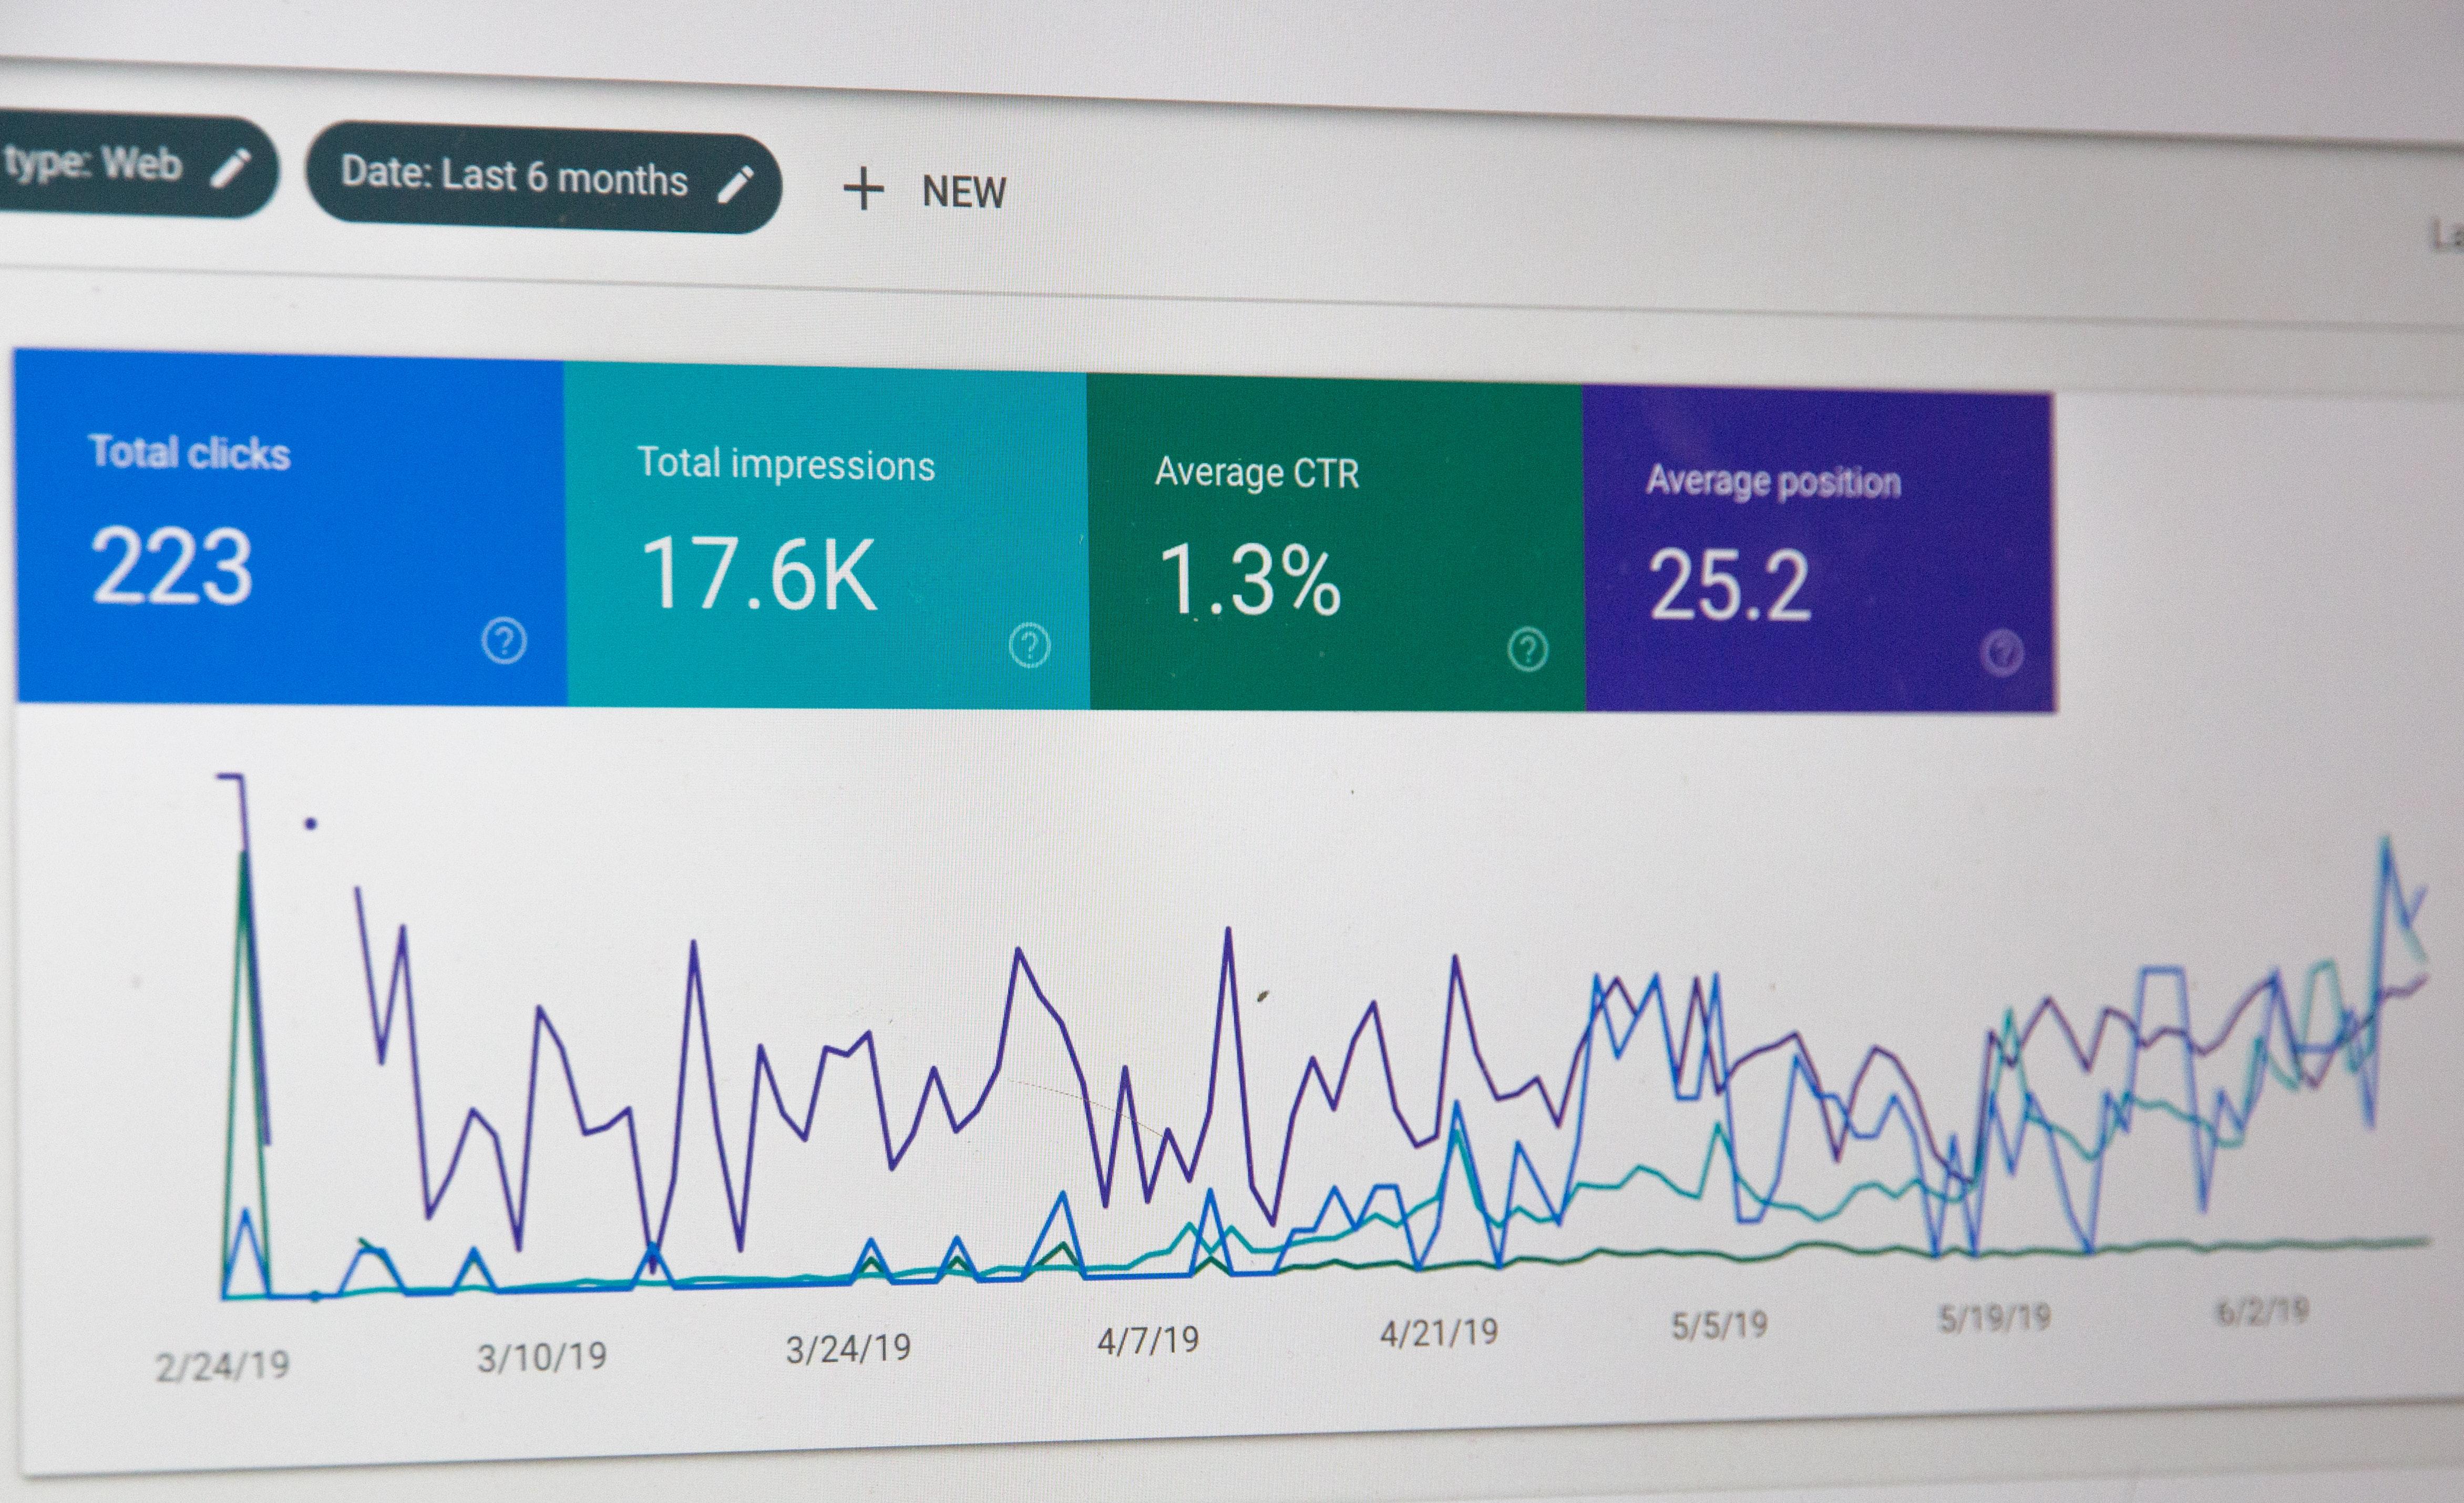 Google Adwords dashboard